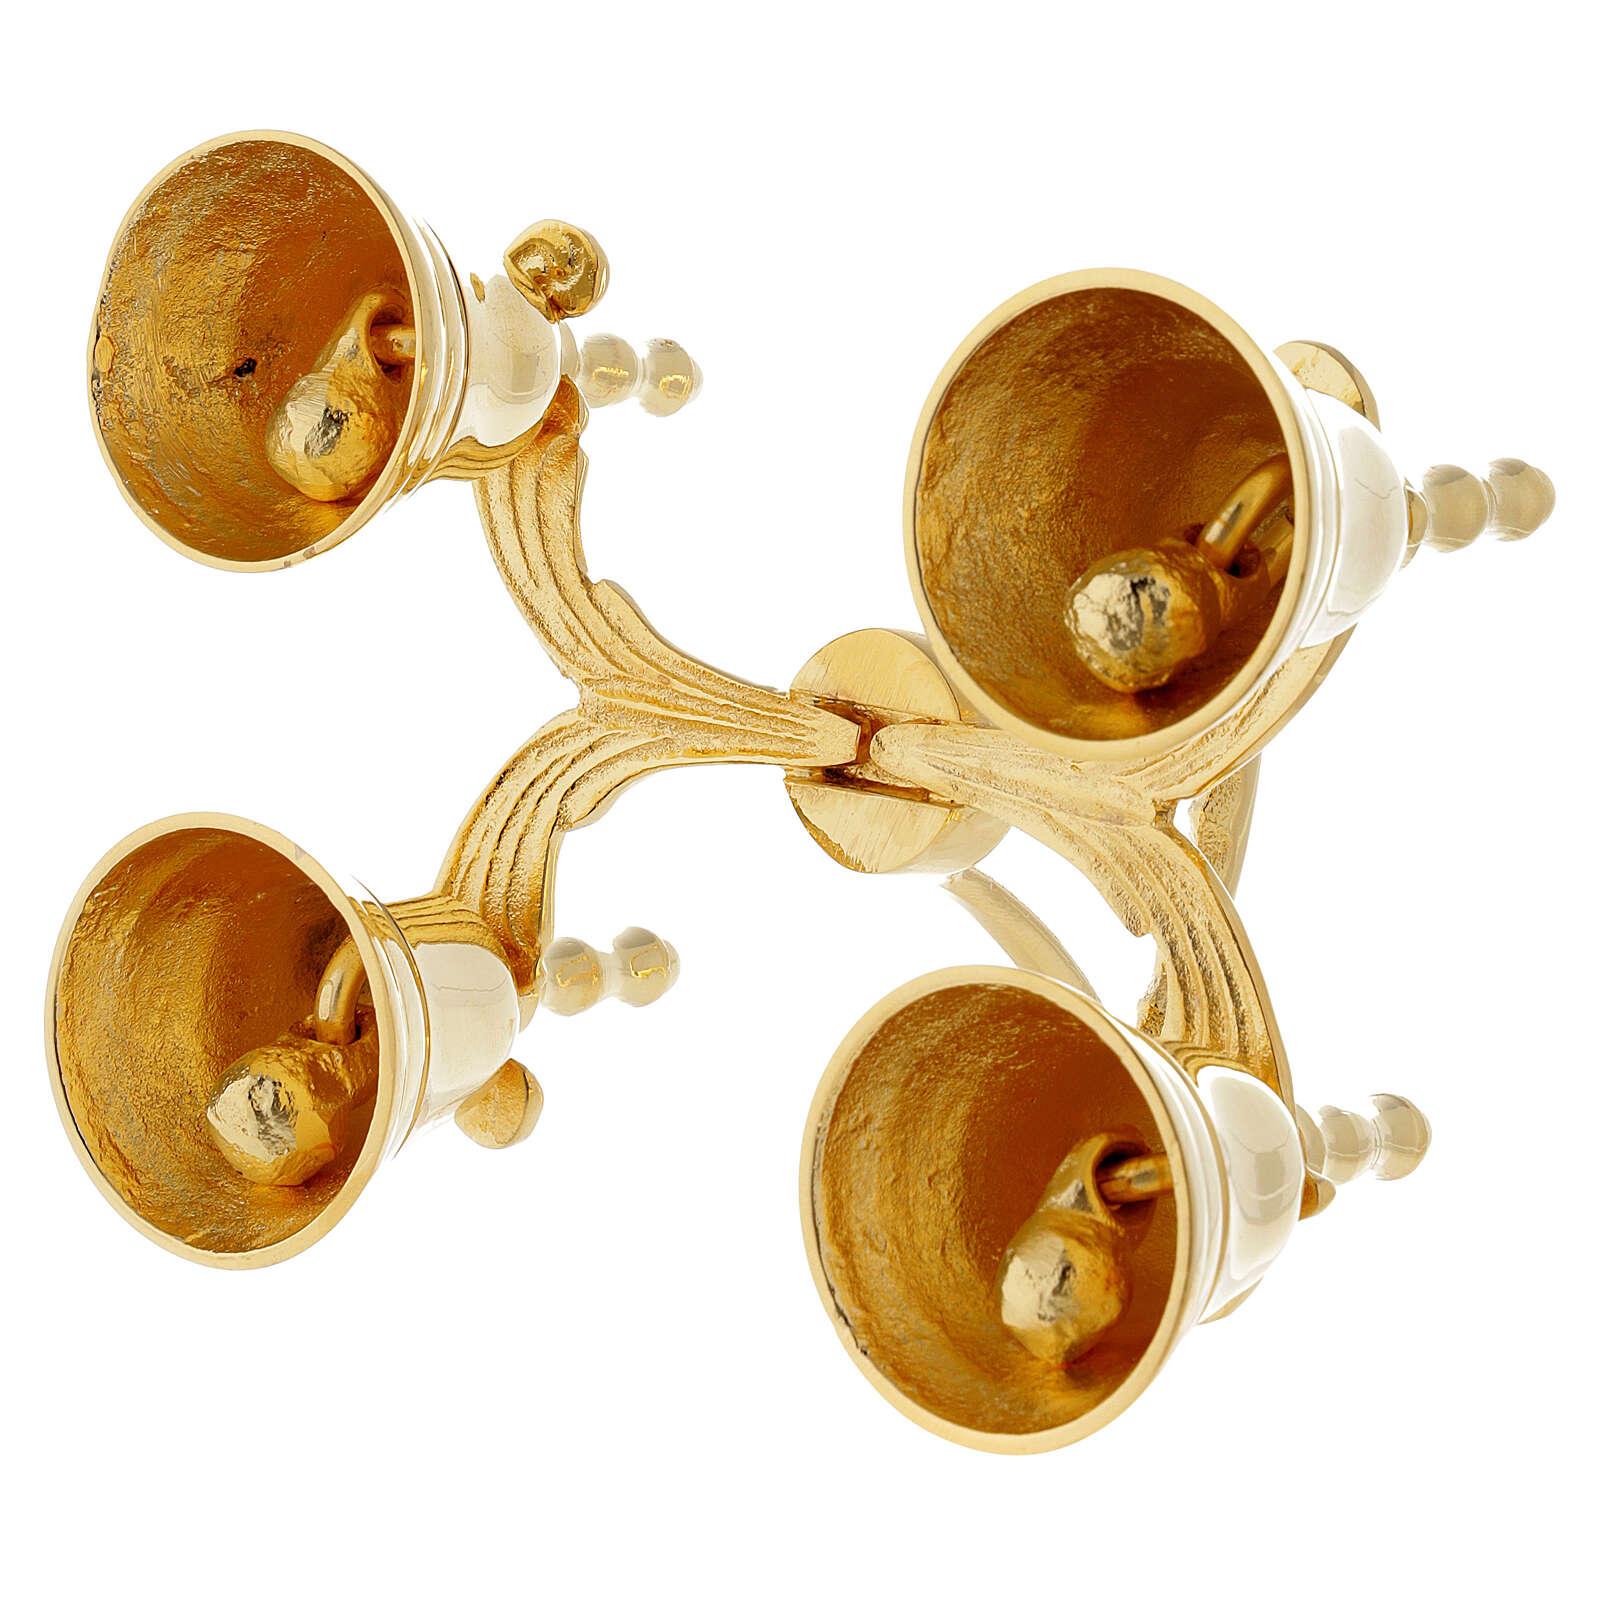 Clochettes quatre sons 3